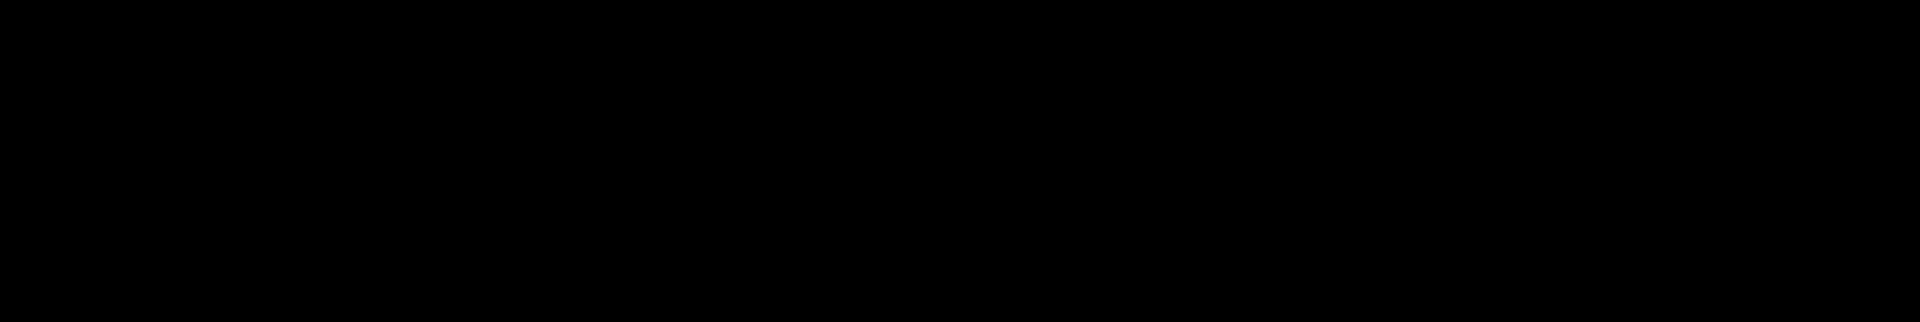 Nikola Tesla Signature